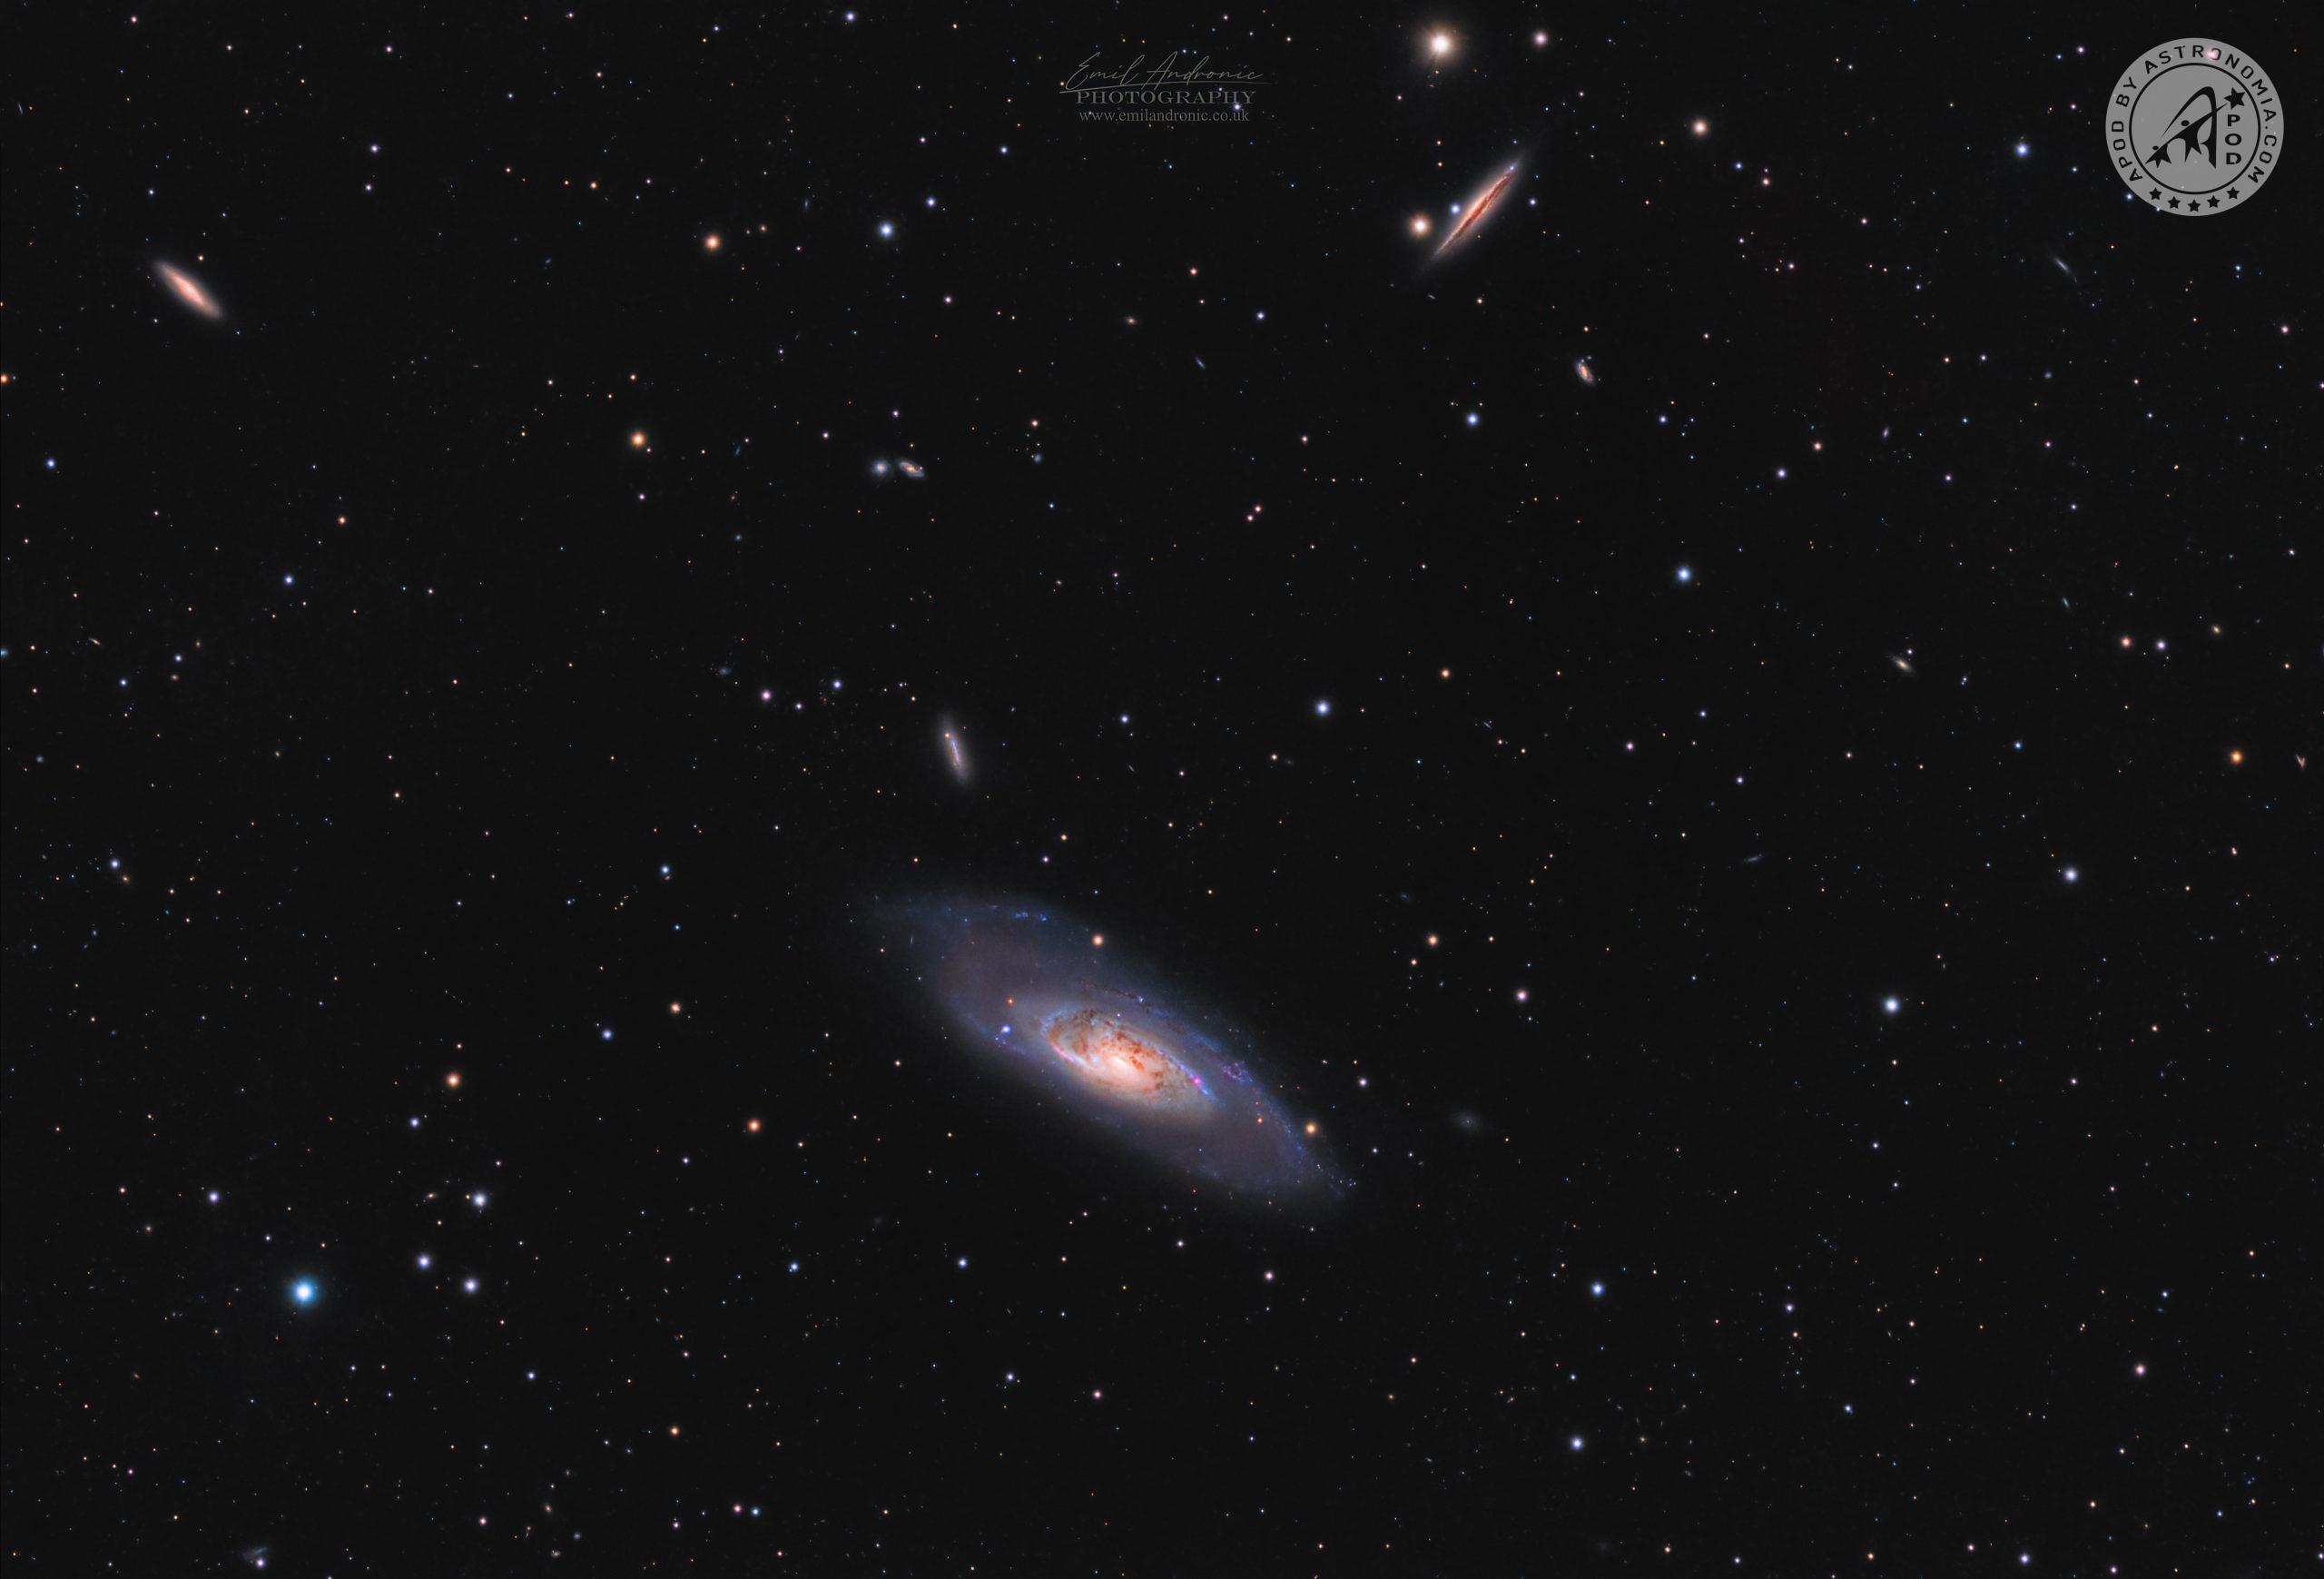 La Galassia M106